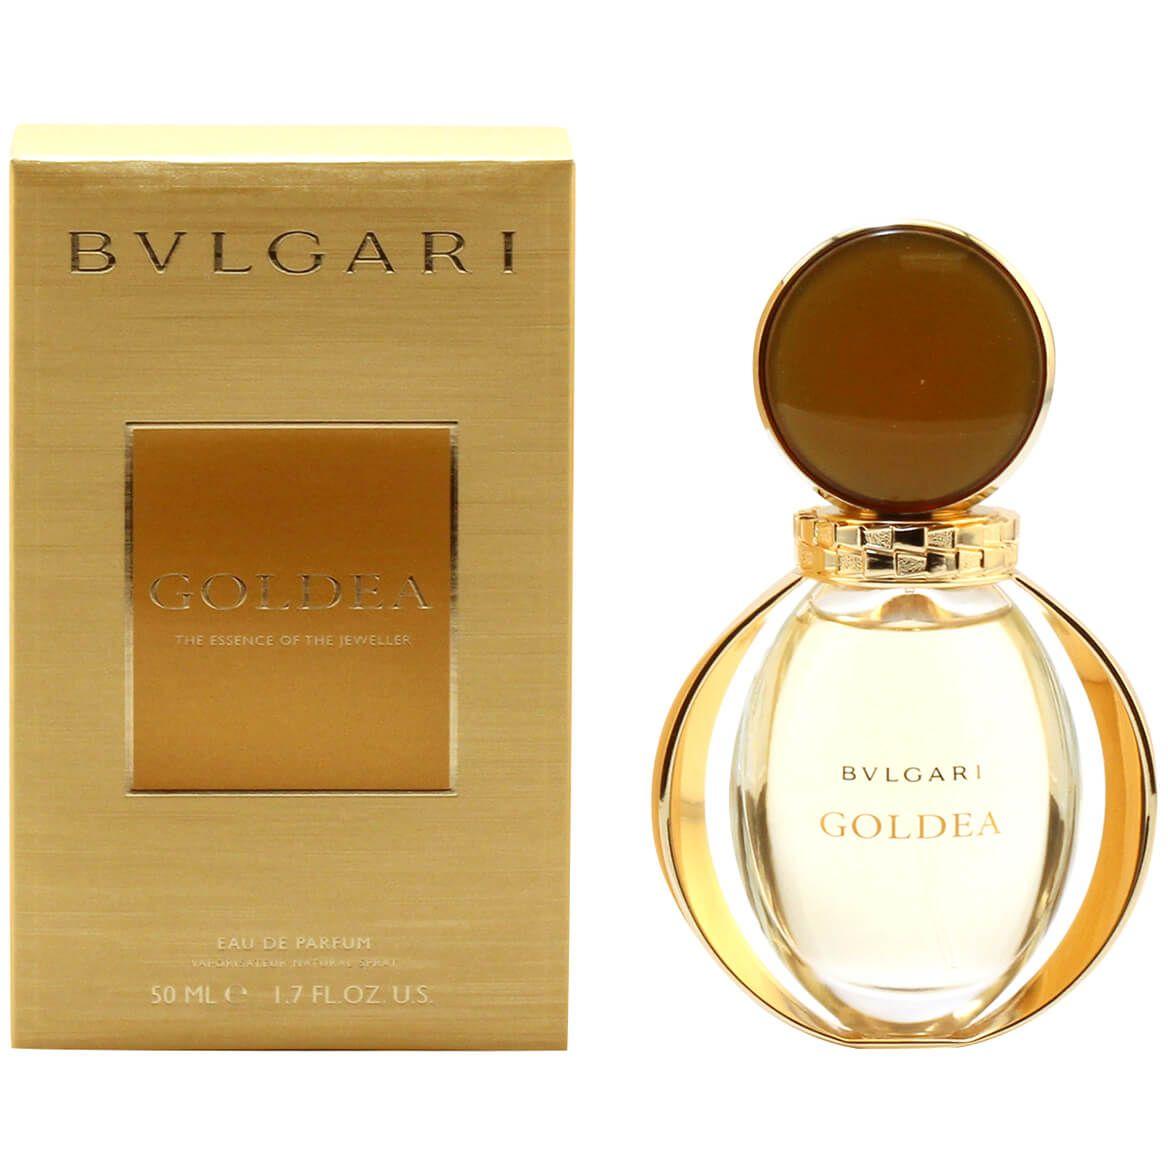 Bvlgari Goldea for Women EDP, 1.7 oz.-366807